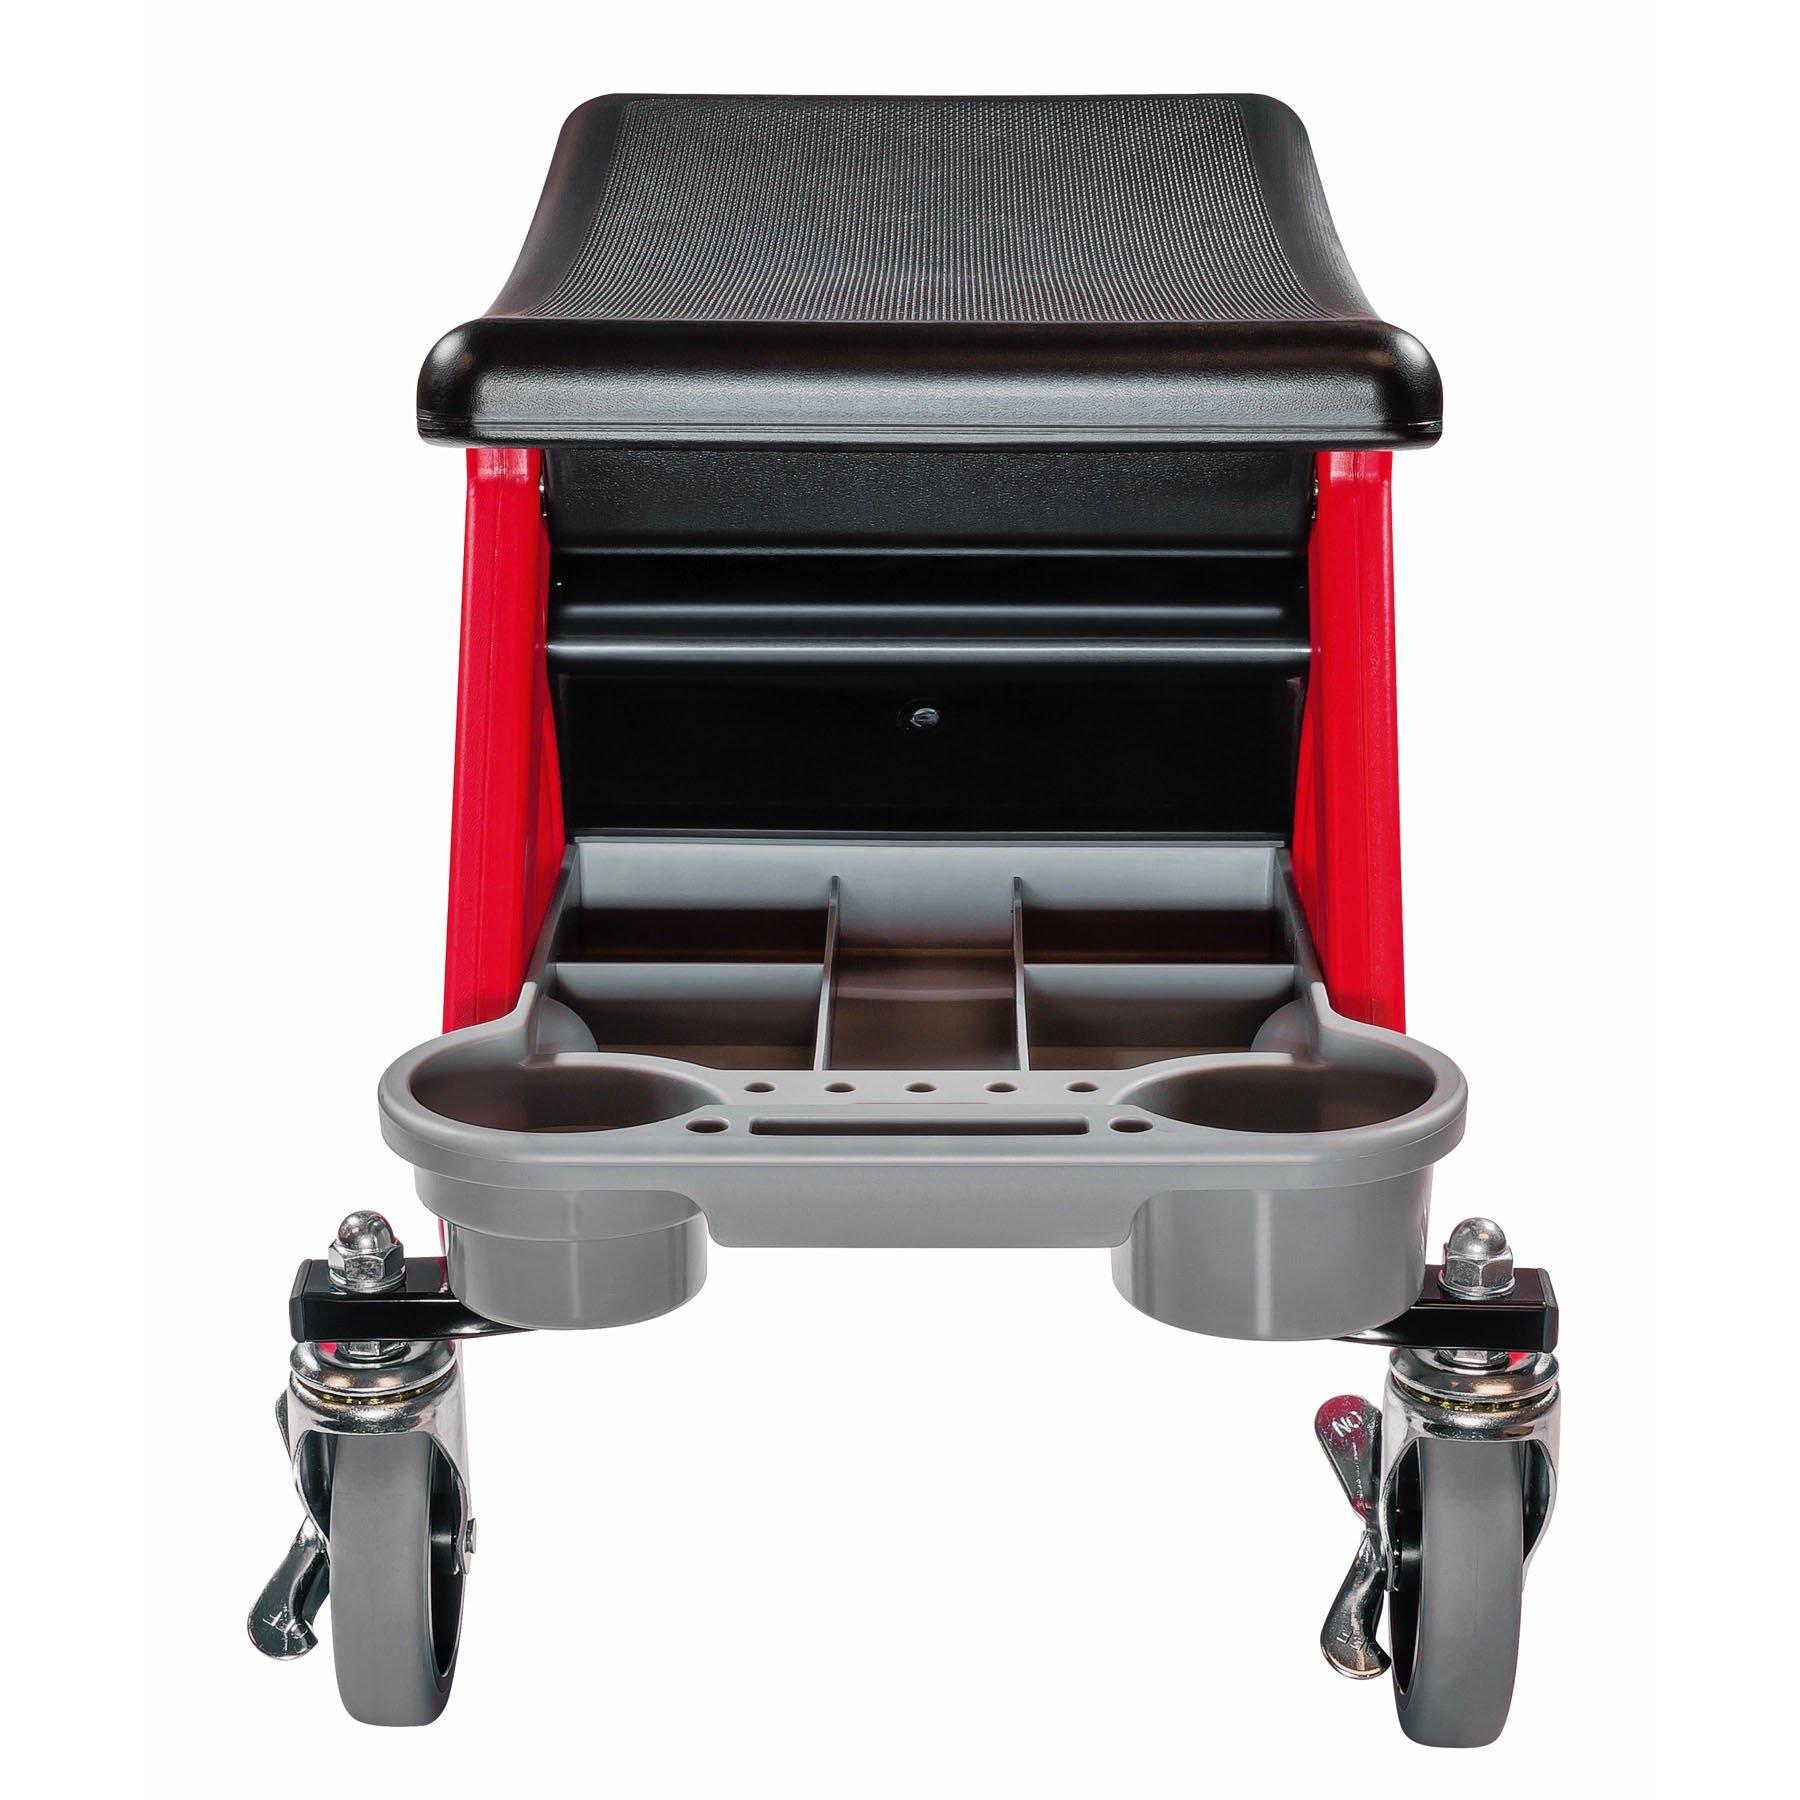 Powerbuilt Heavy Duty Rolling Mechanics Seat Brake Stool 300lb Capacity - 240036 (Stool) by Powerbuilt (Image #4)